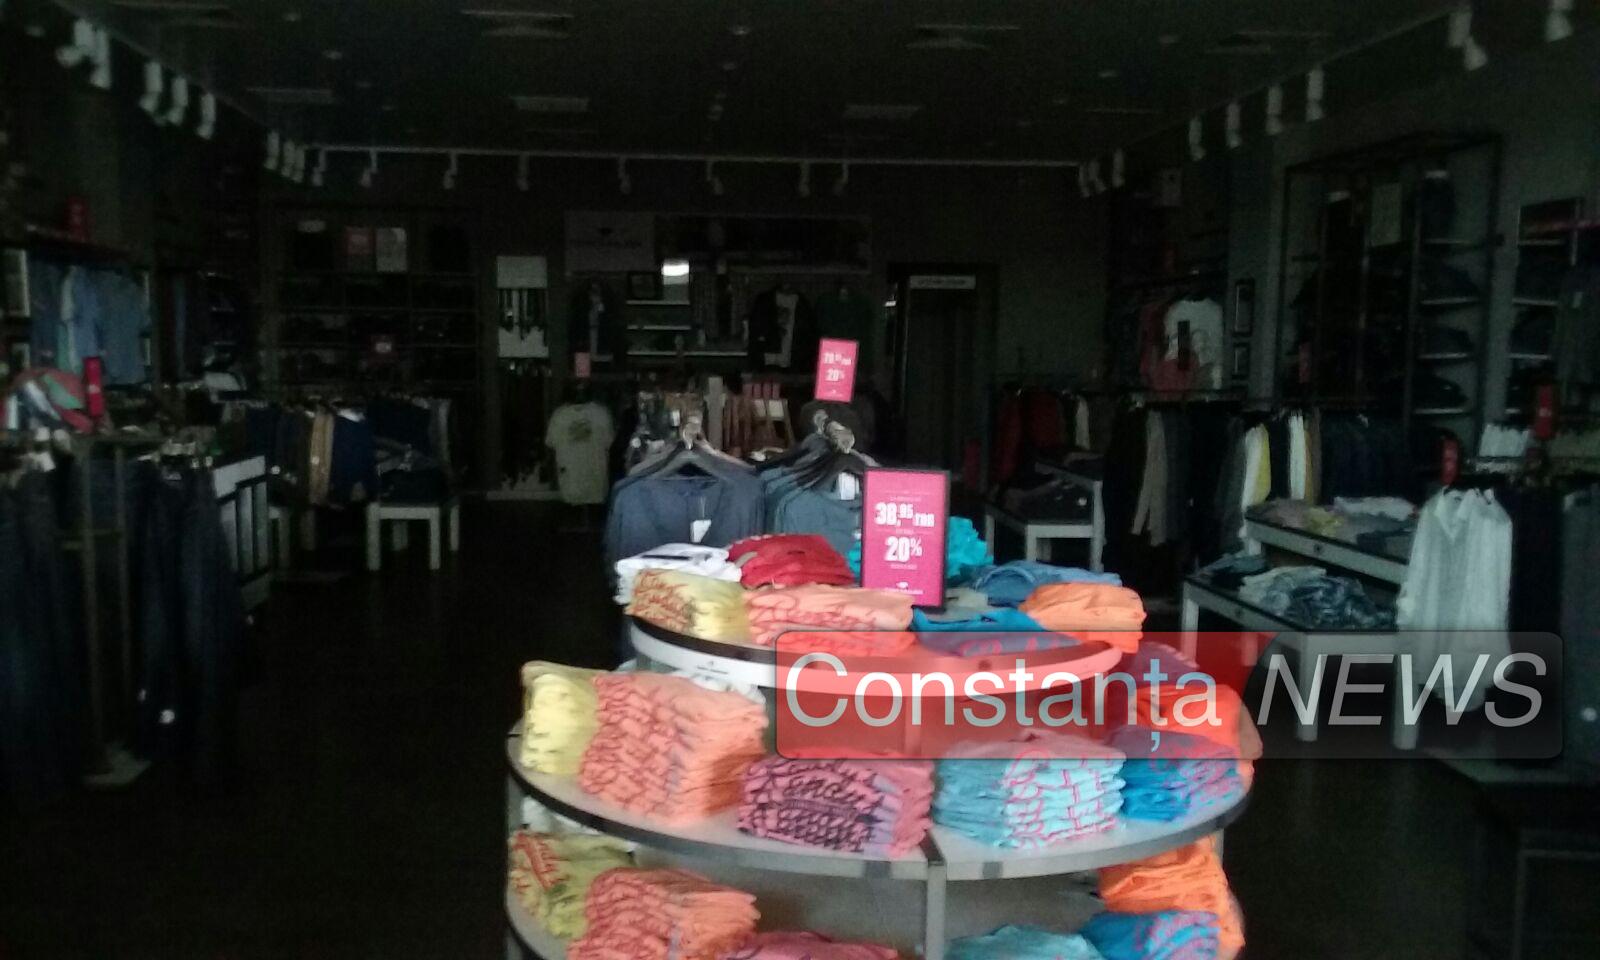 Pana de curent a lăsat magazinele goale. FOTO ctnews.ro